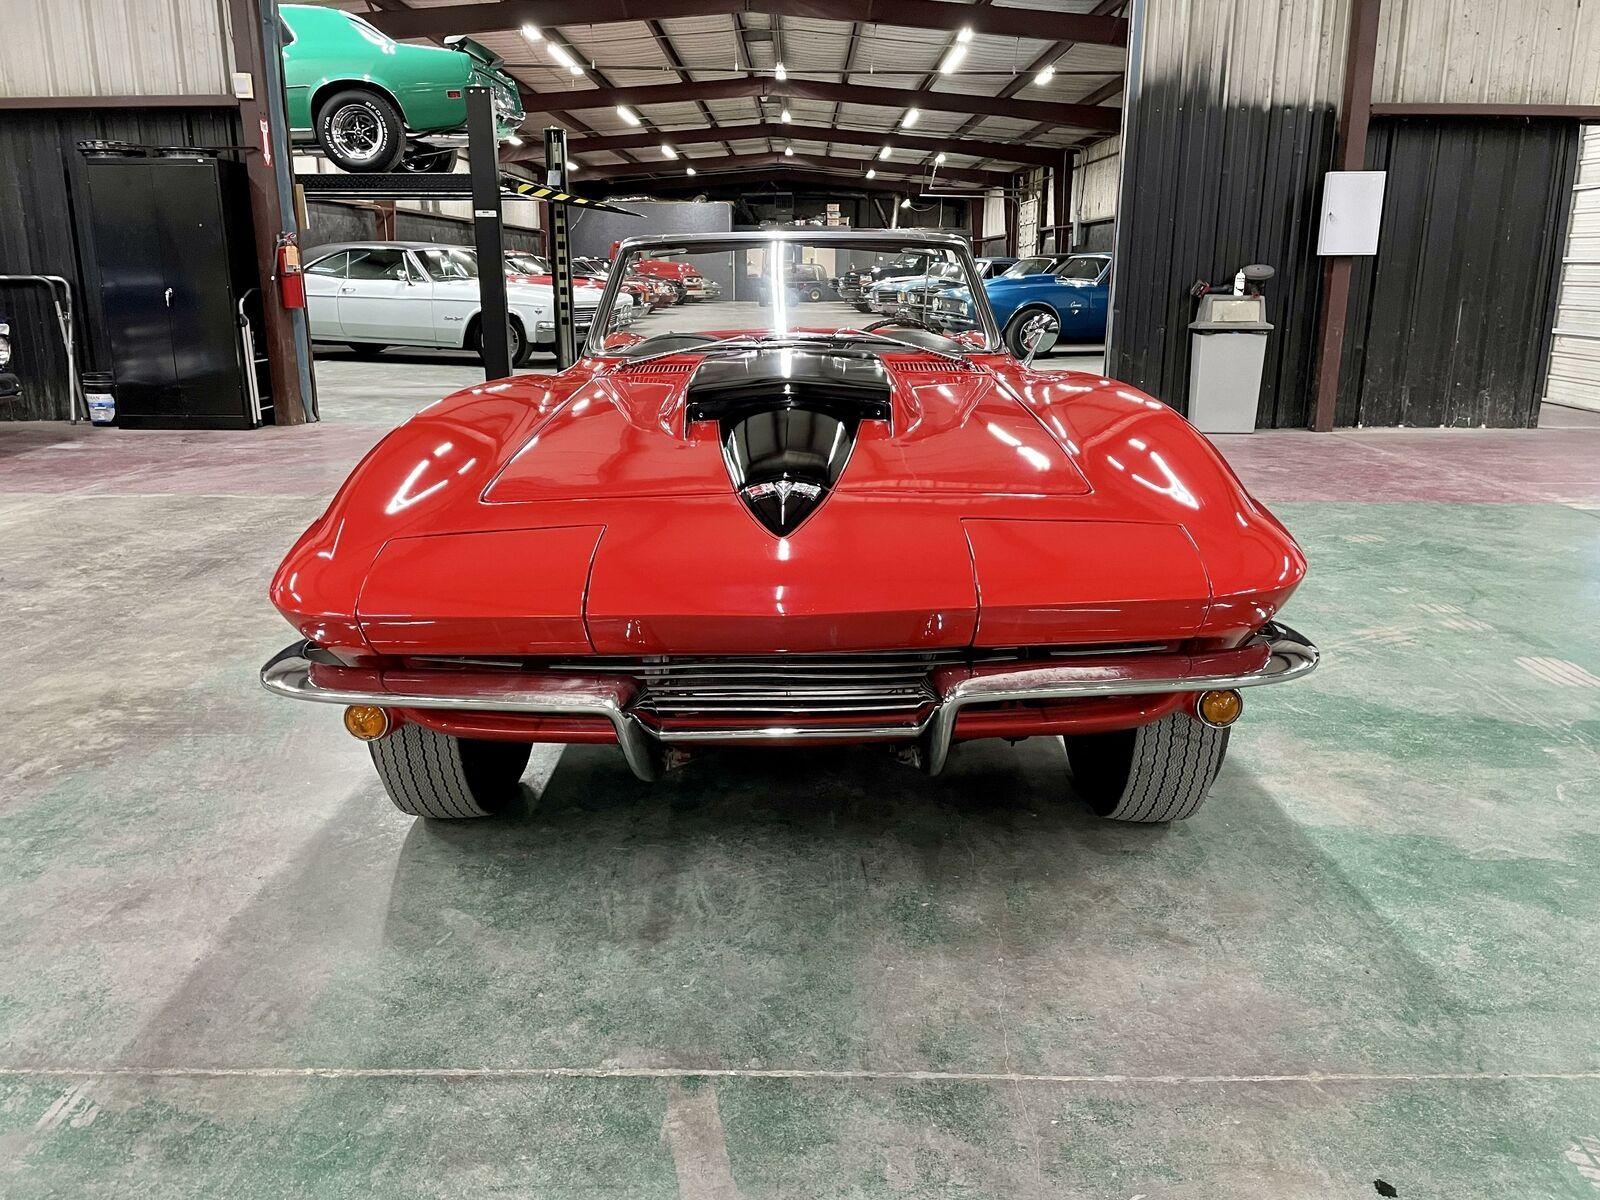 1964 Red Chevrolet Corvette   | C2 Corvette Photo 8